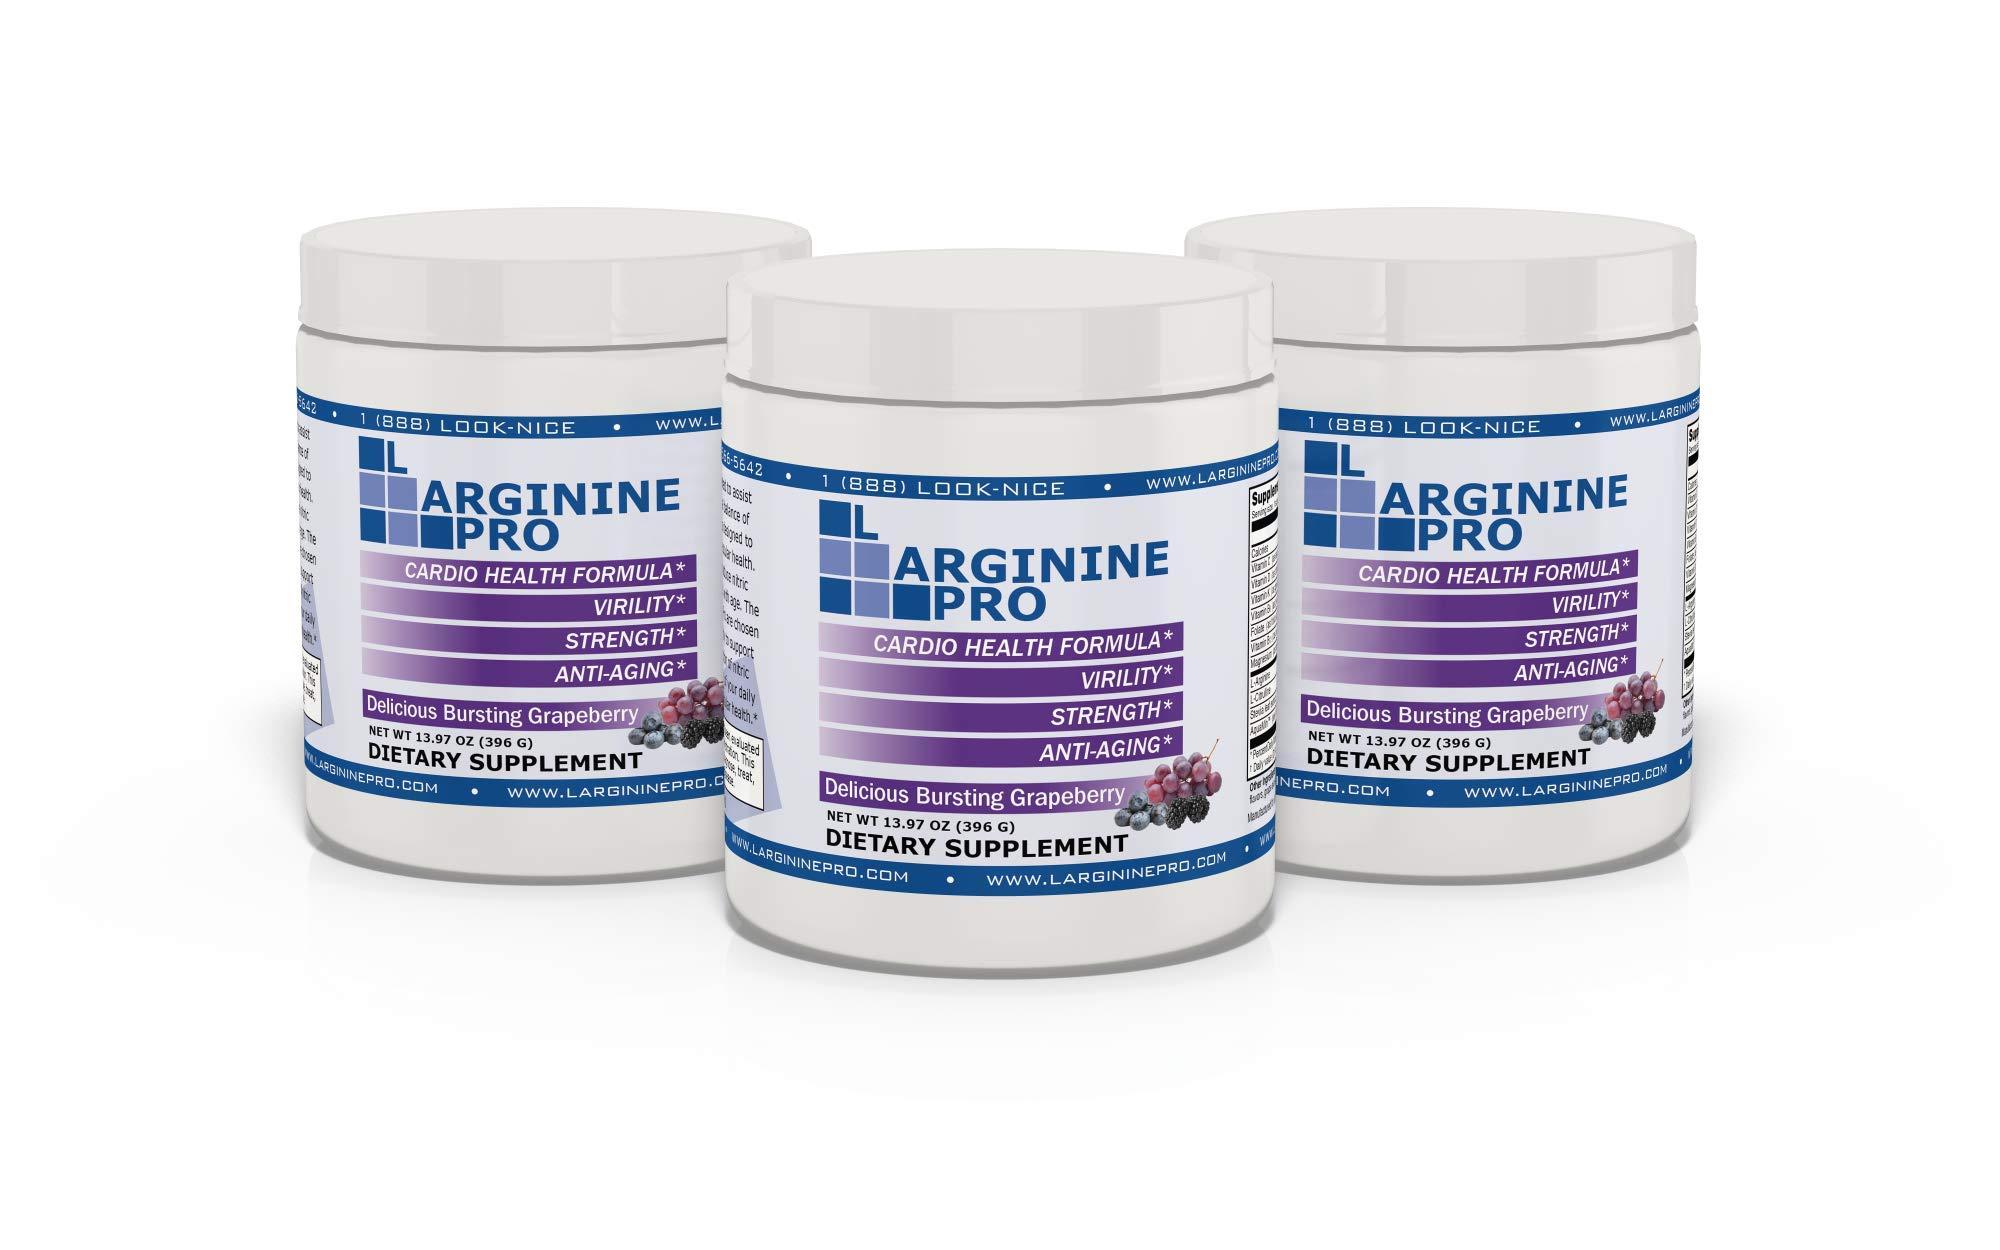 L-arginine Pro, #1 NOW L-arginine Supplement - 5,500mg of L-arginine PLUS 1,100mg L-Citrulline + Vitamins & Minerals for Cardio Health, Blood Pressure, Cholesterol, Energy, Sleep, 13.97 oz by L-arginine Pro